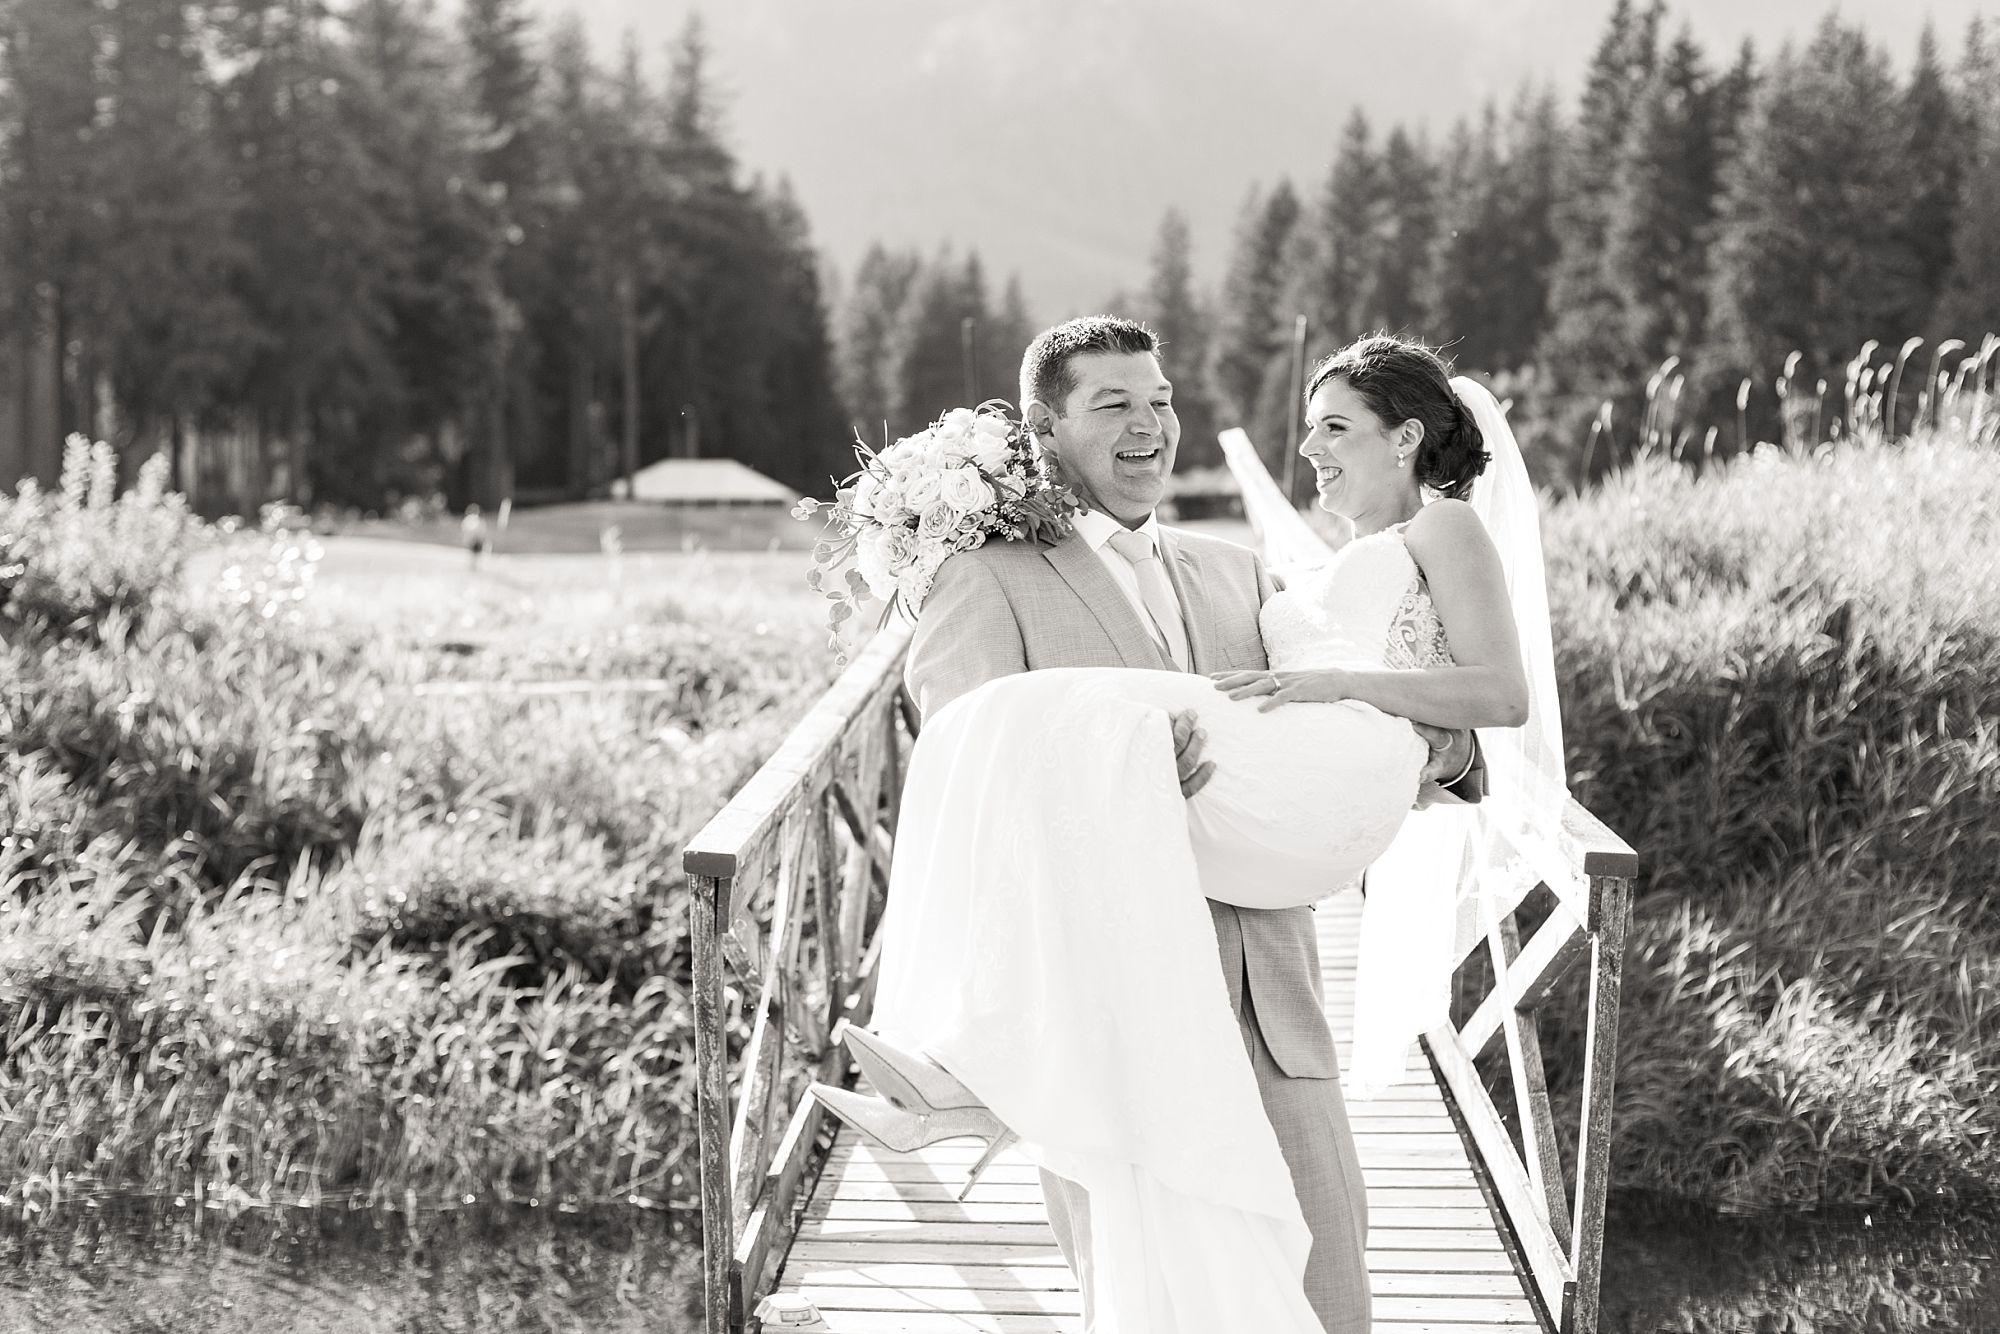 Vancouver Wedding Photography Hayley Rae Photography Associate_0013.jpg